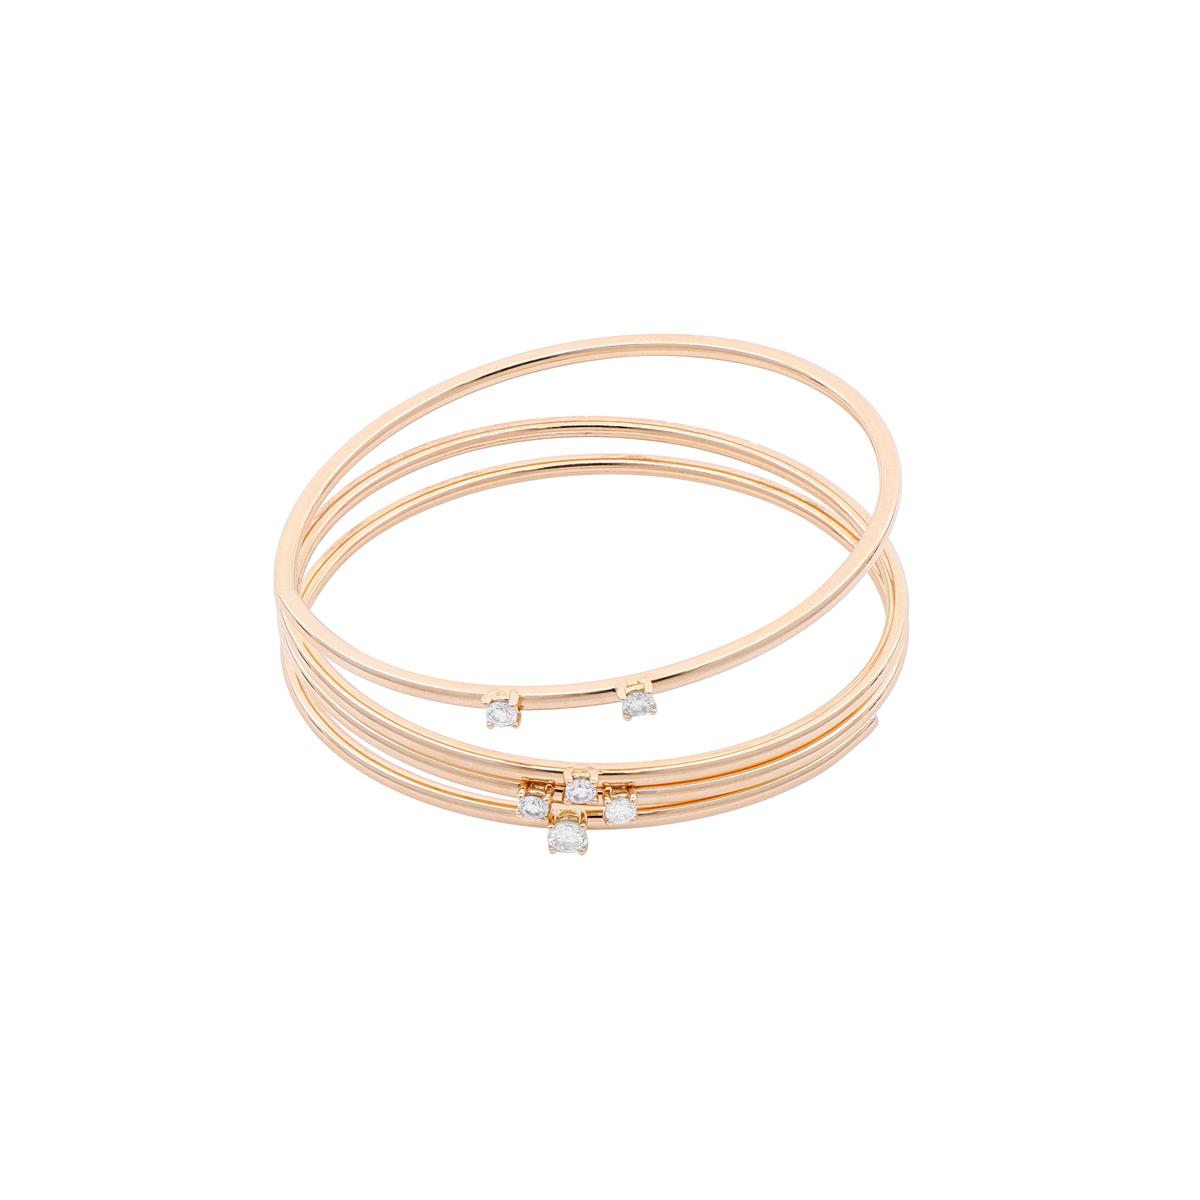 Red Gold Spiral Bangle Bracelet with Diamonds